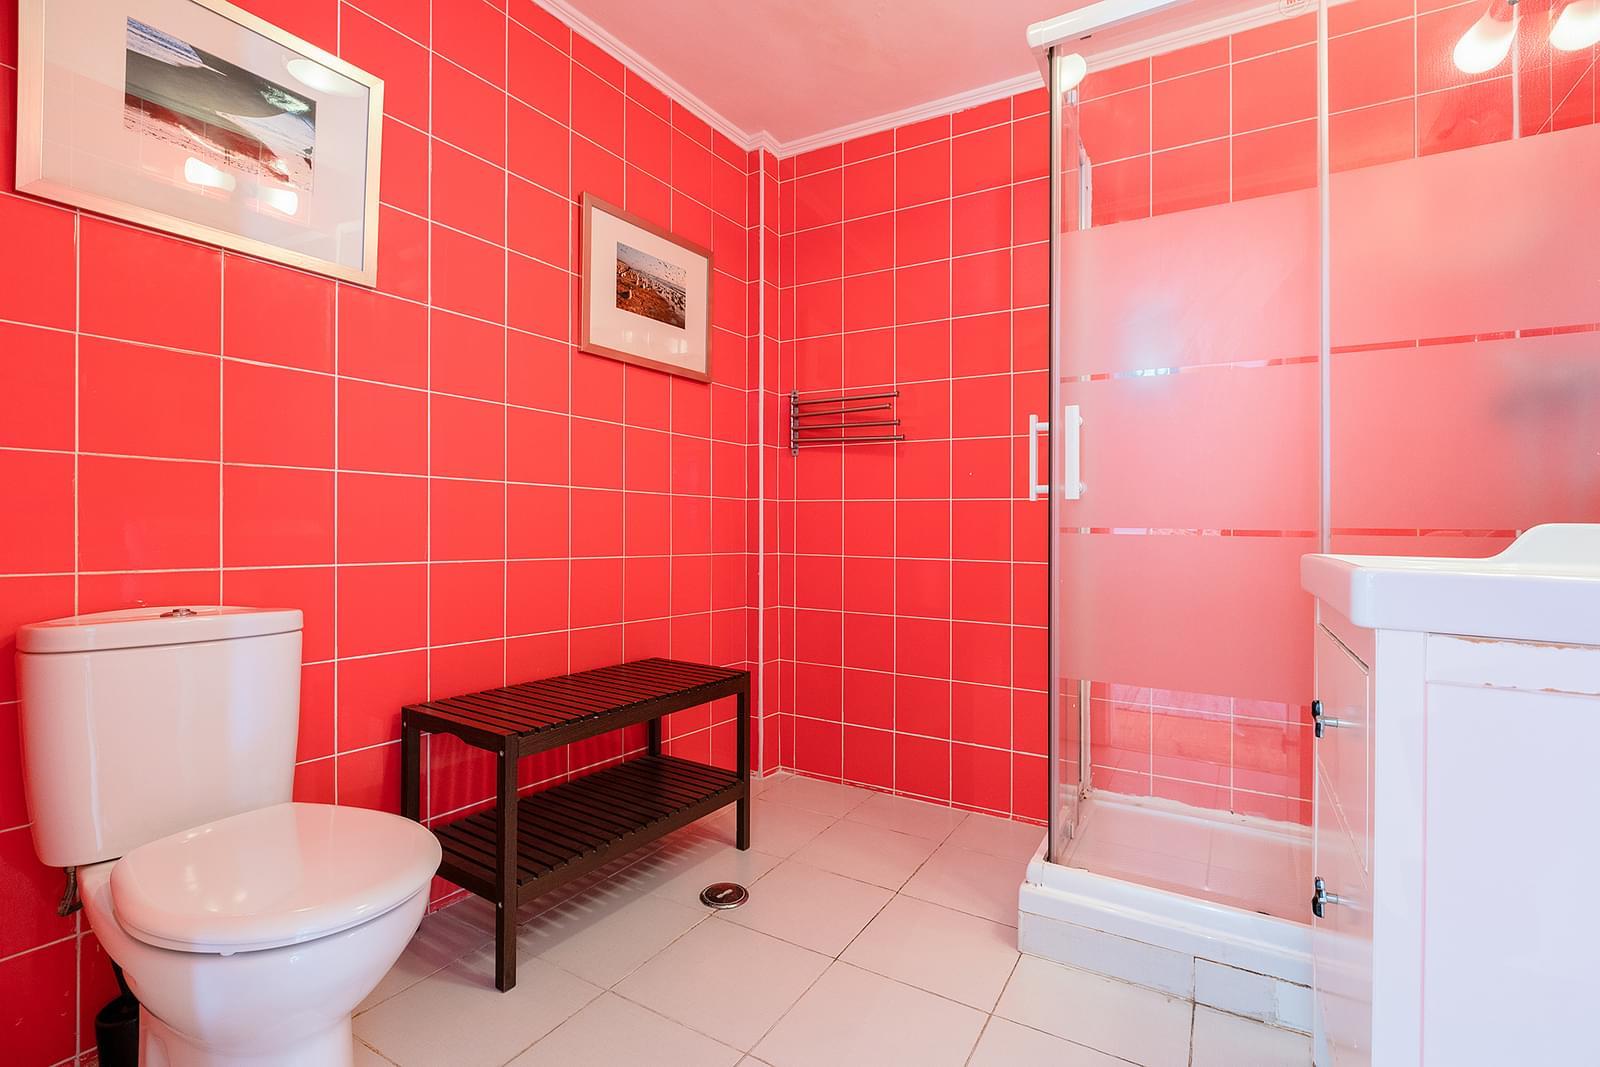 pf18727-apartamento-t1-lisboa-44b5d18c-eafe-437f-ac3f-5b81a3b3a59a